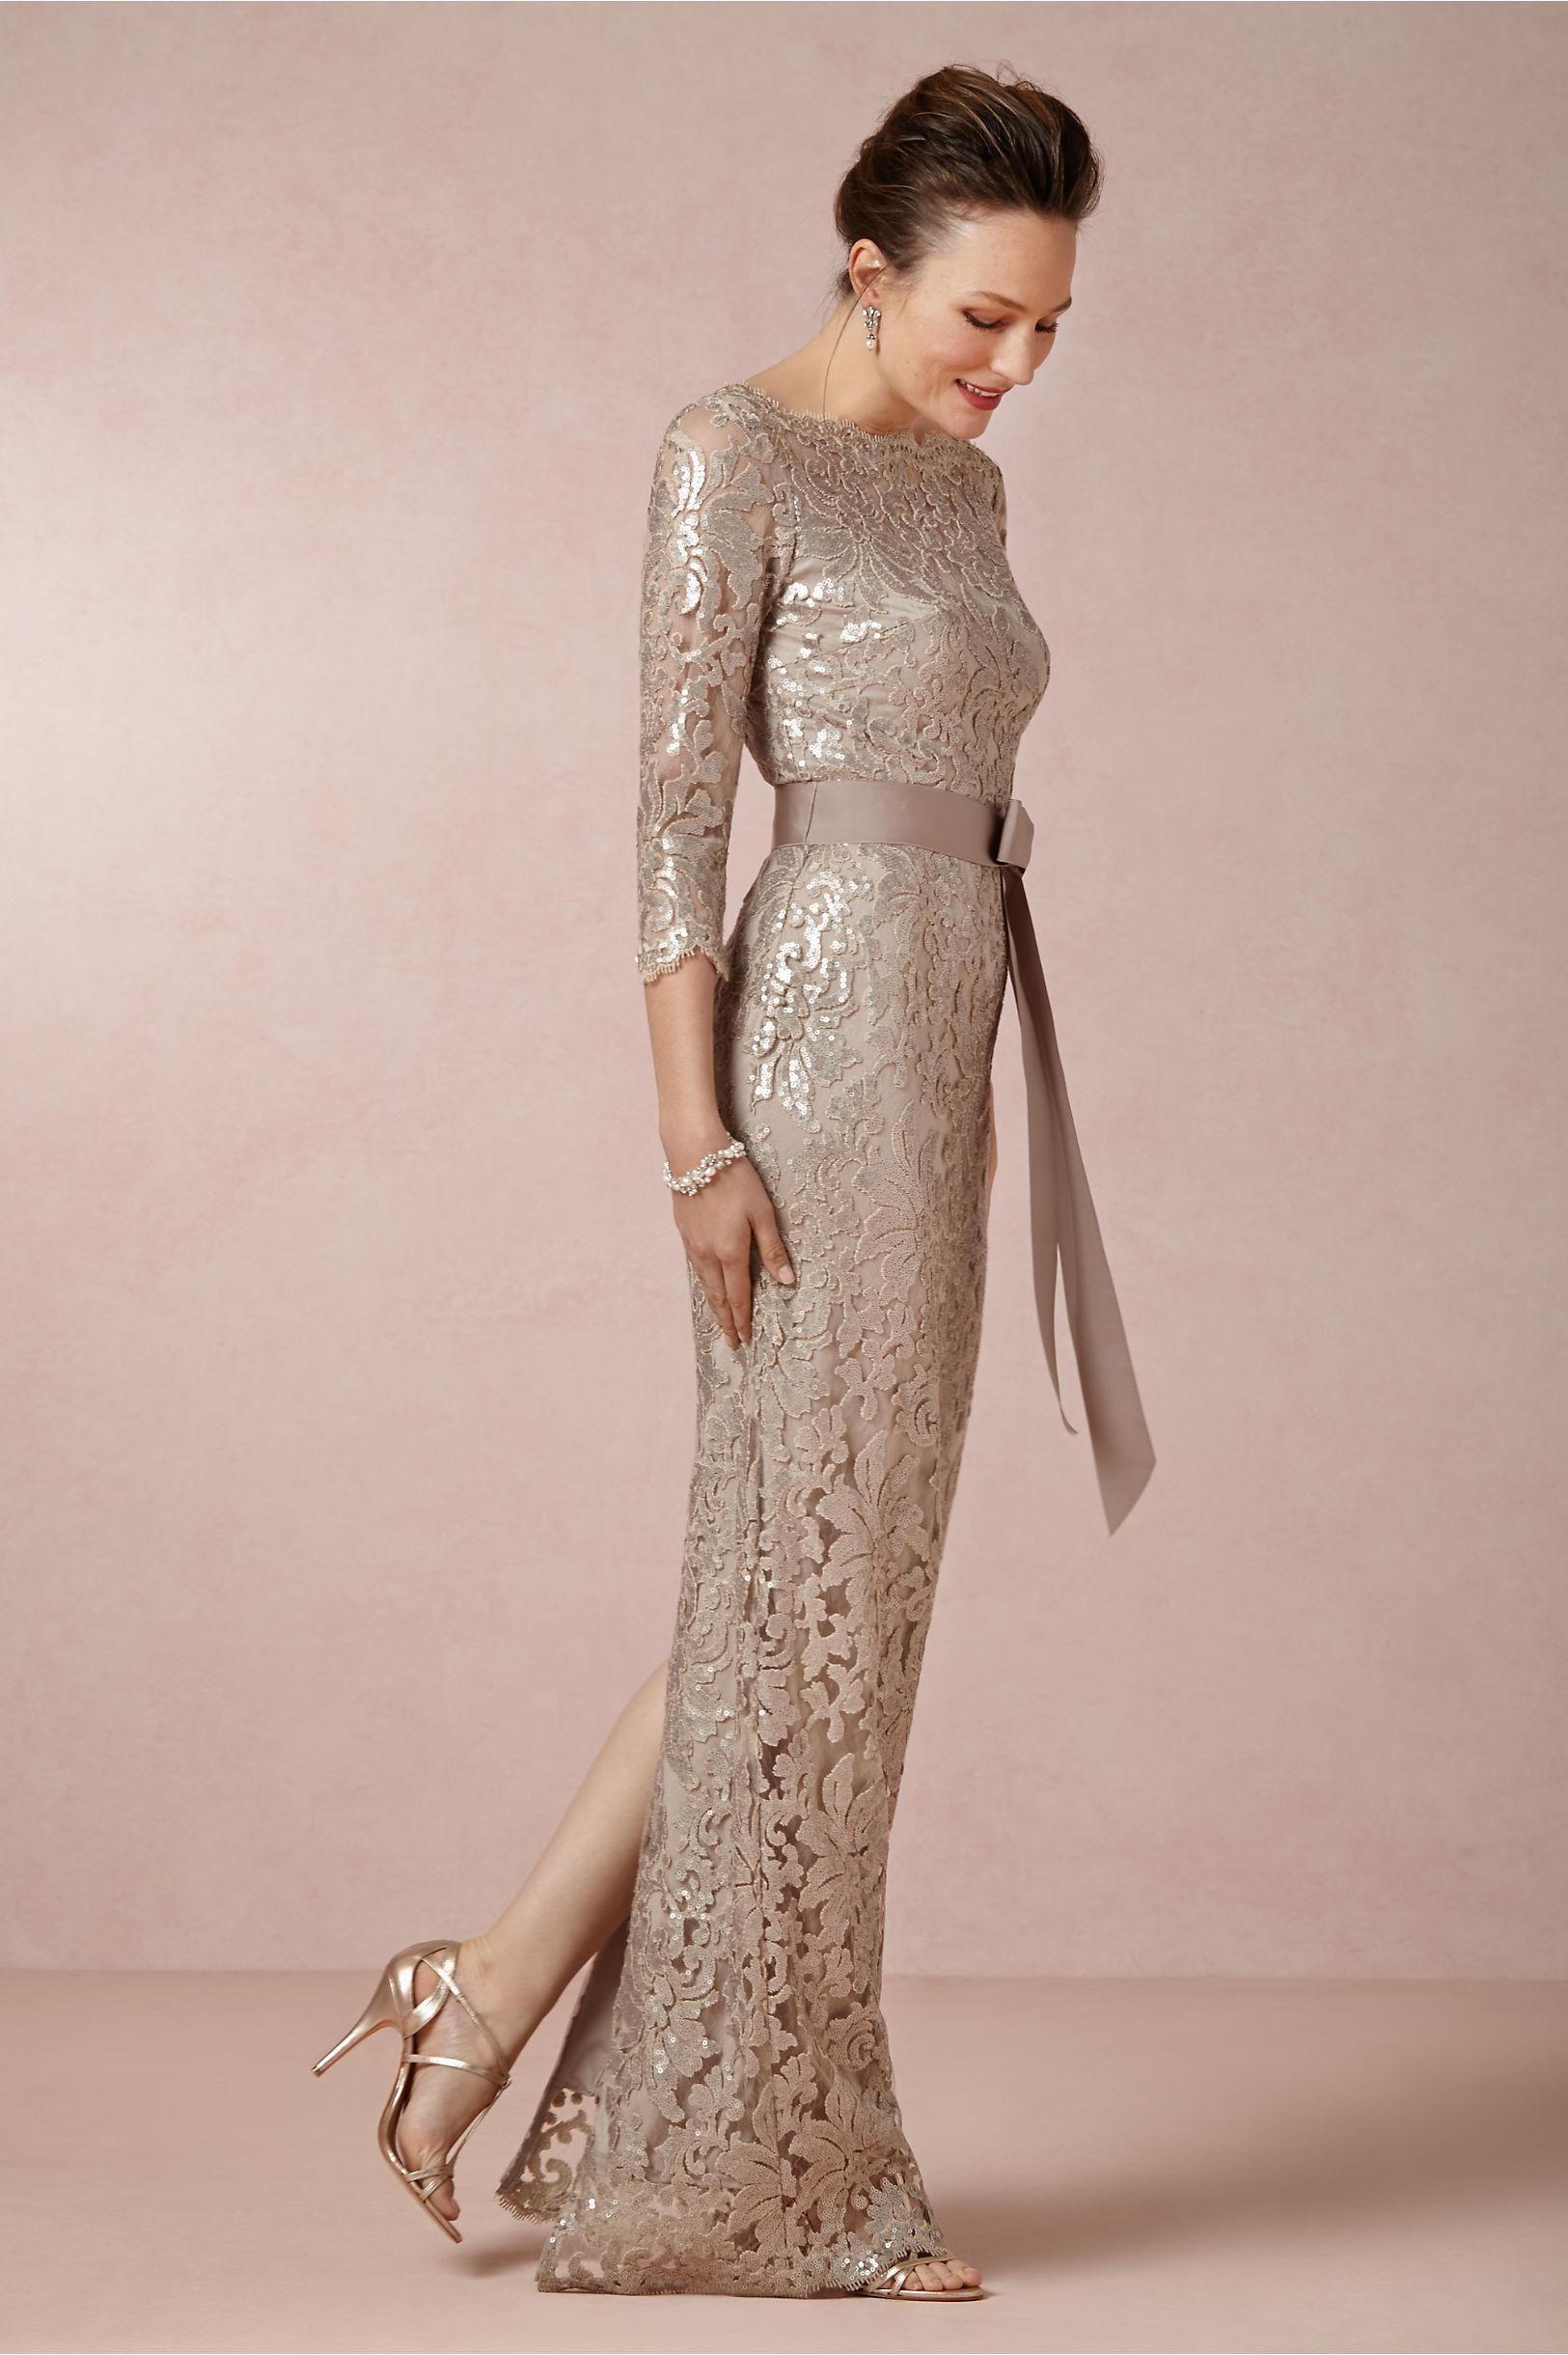 Winter Wedding Mother of Bride Dresses